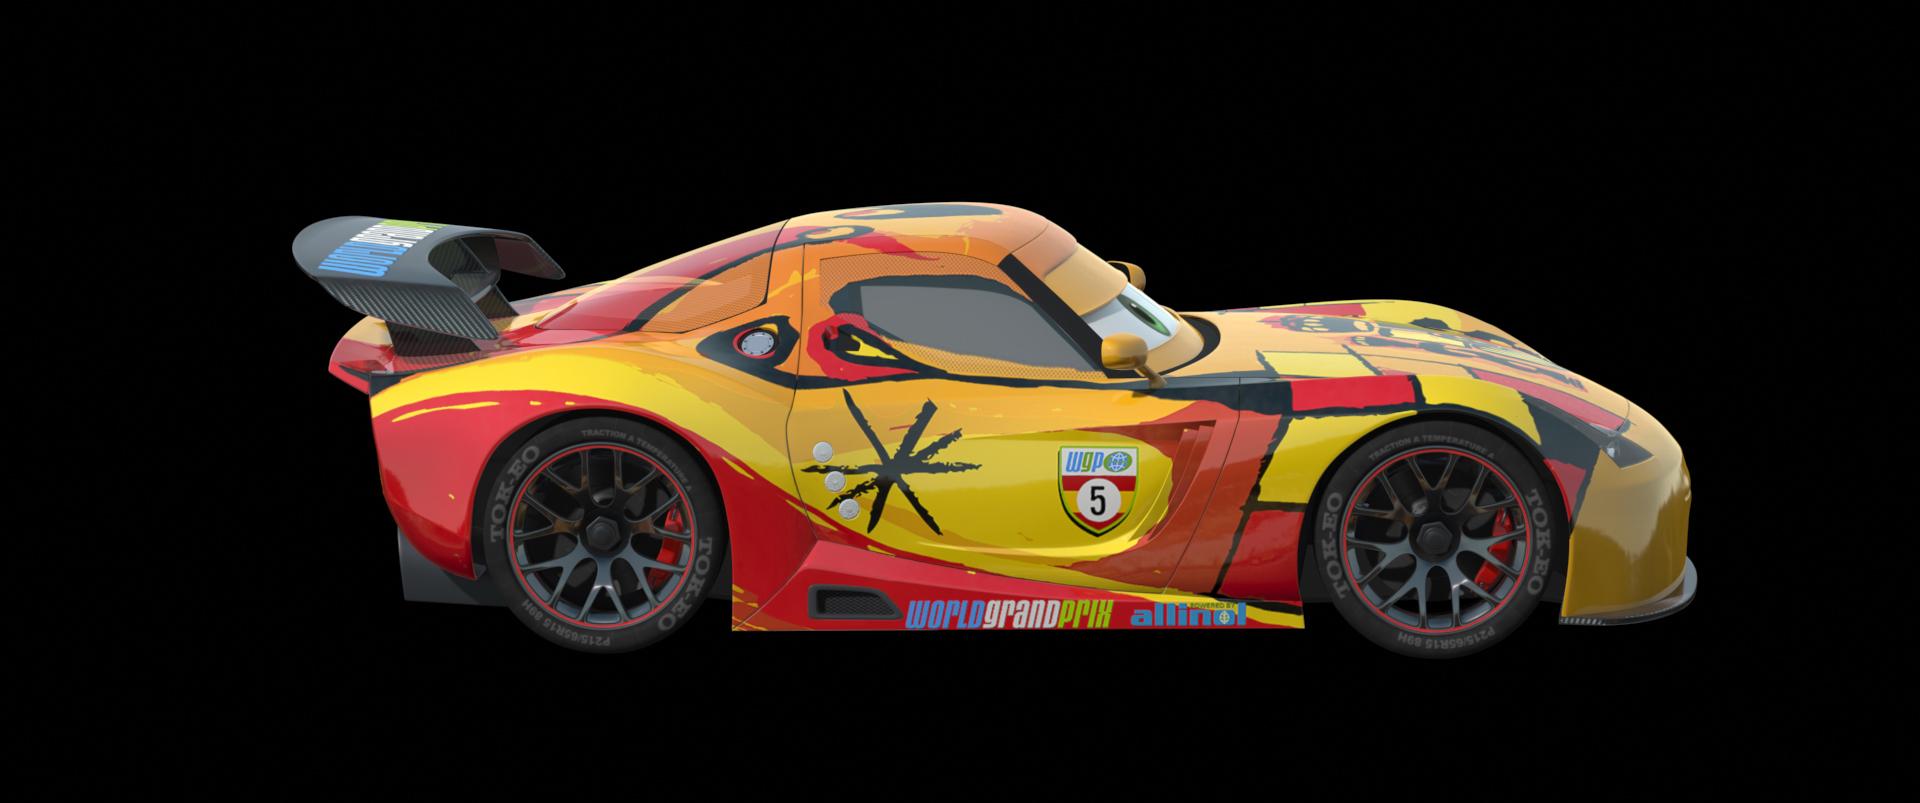 Image cars 2 concept art pixar wiki disney pixar animation studios - Coloriage cars 2 miguel camino ...